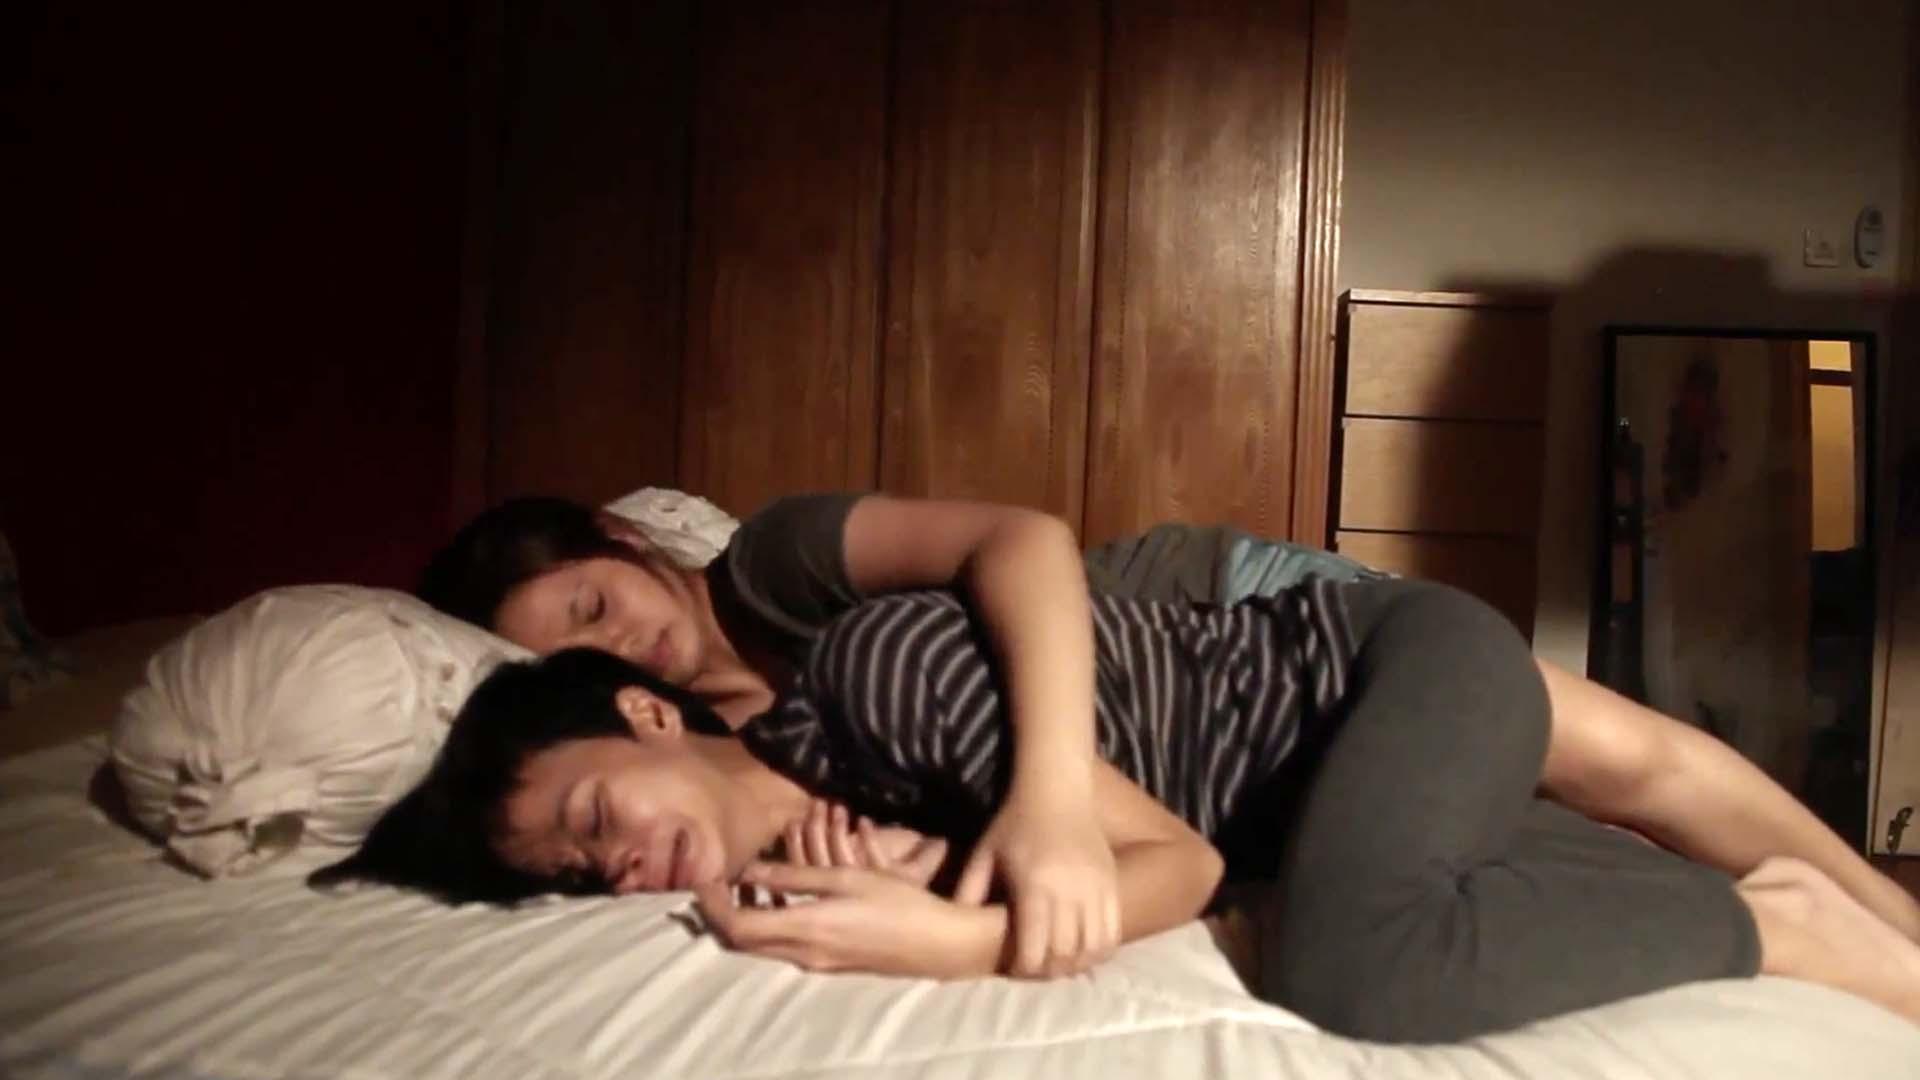 Diri by Sharifah Aleysha - Malaysia Drama Short Film | Viddsee